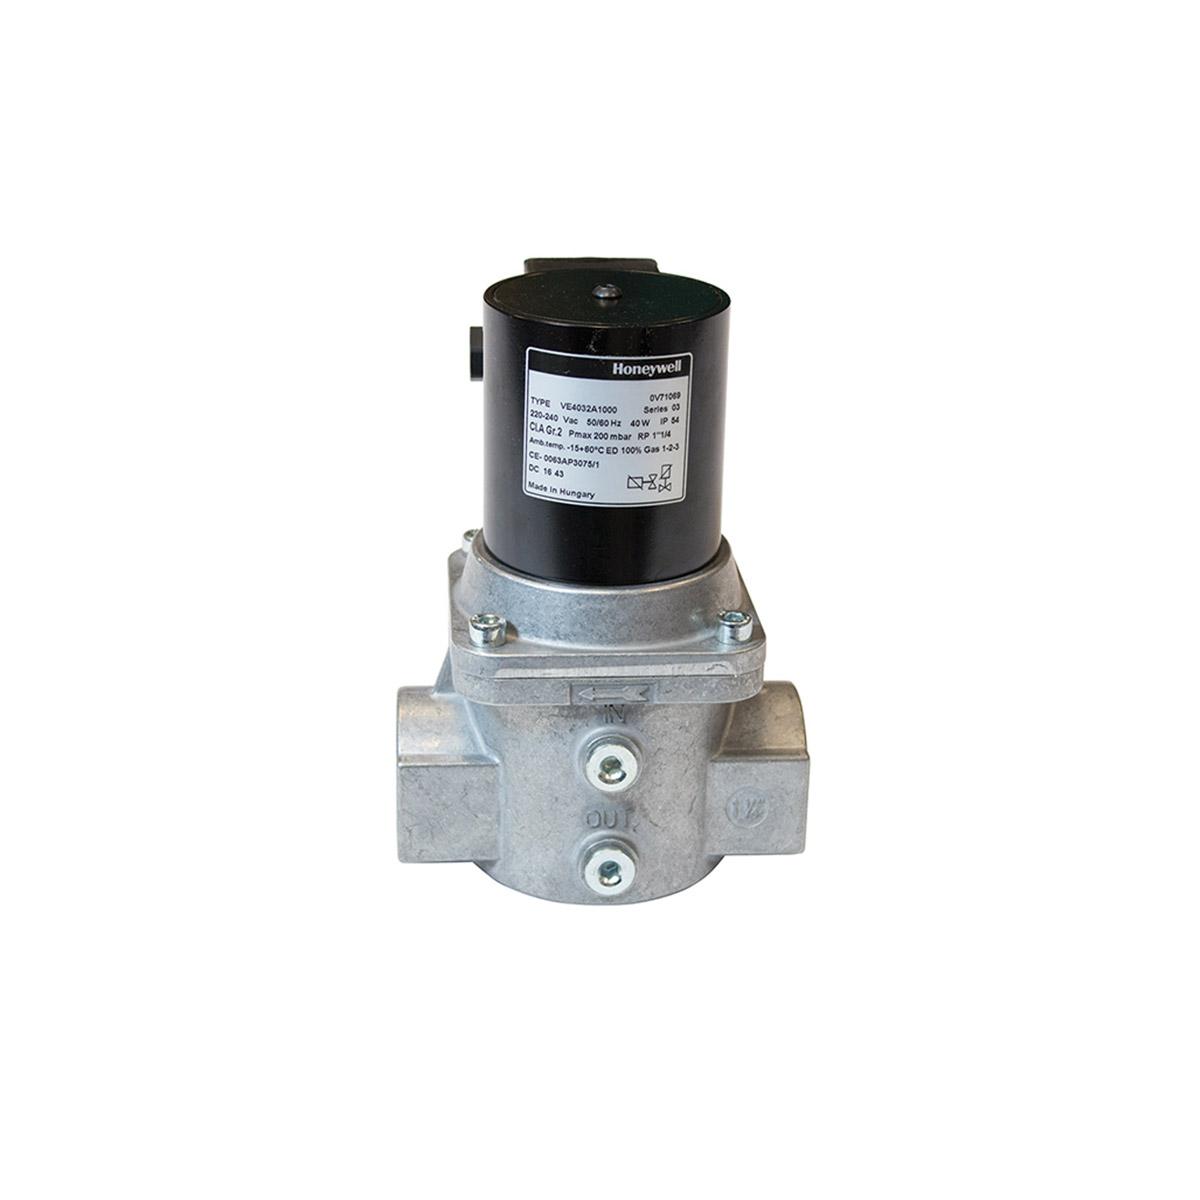 CaterGuard M-VE125 1 1/4-Inch Gas Solenoid Valve